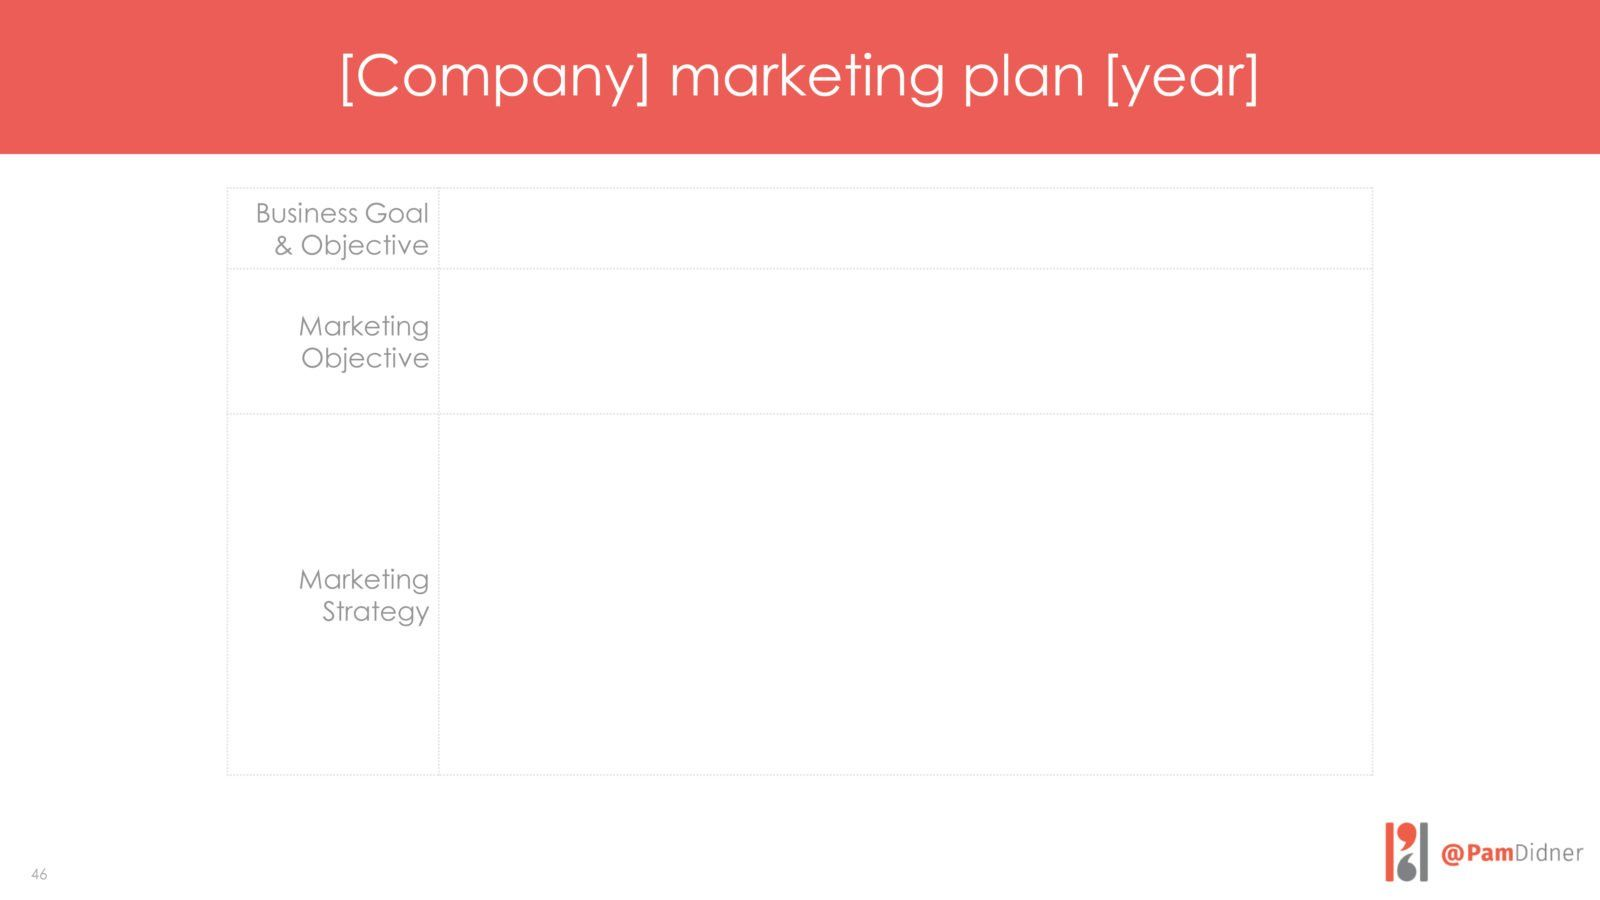 marketing plan example 1